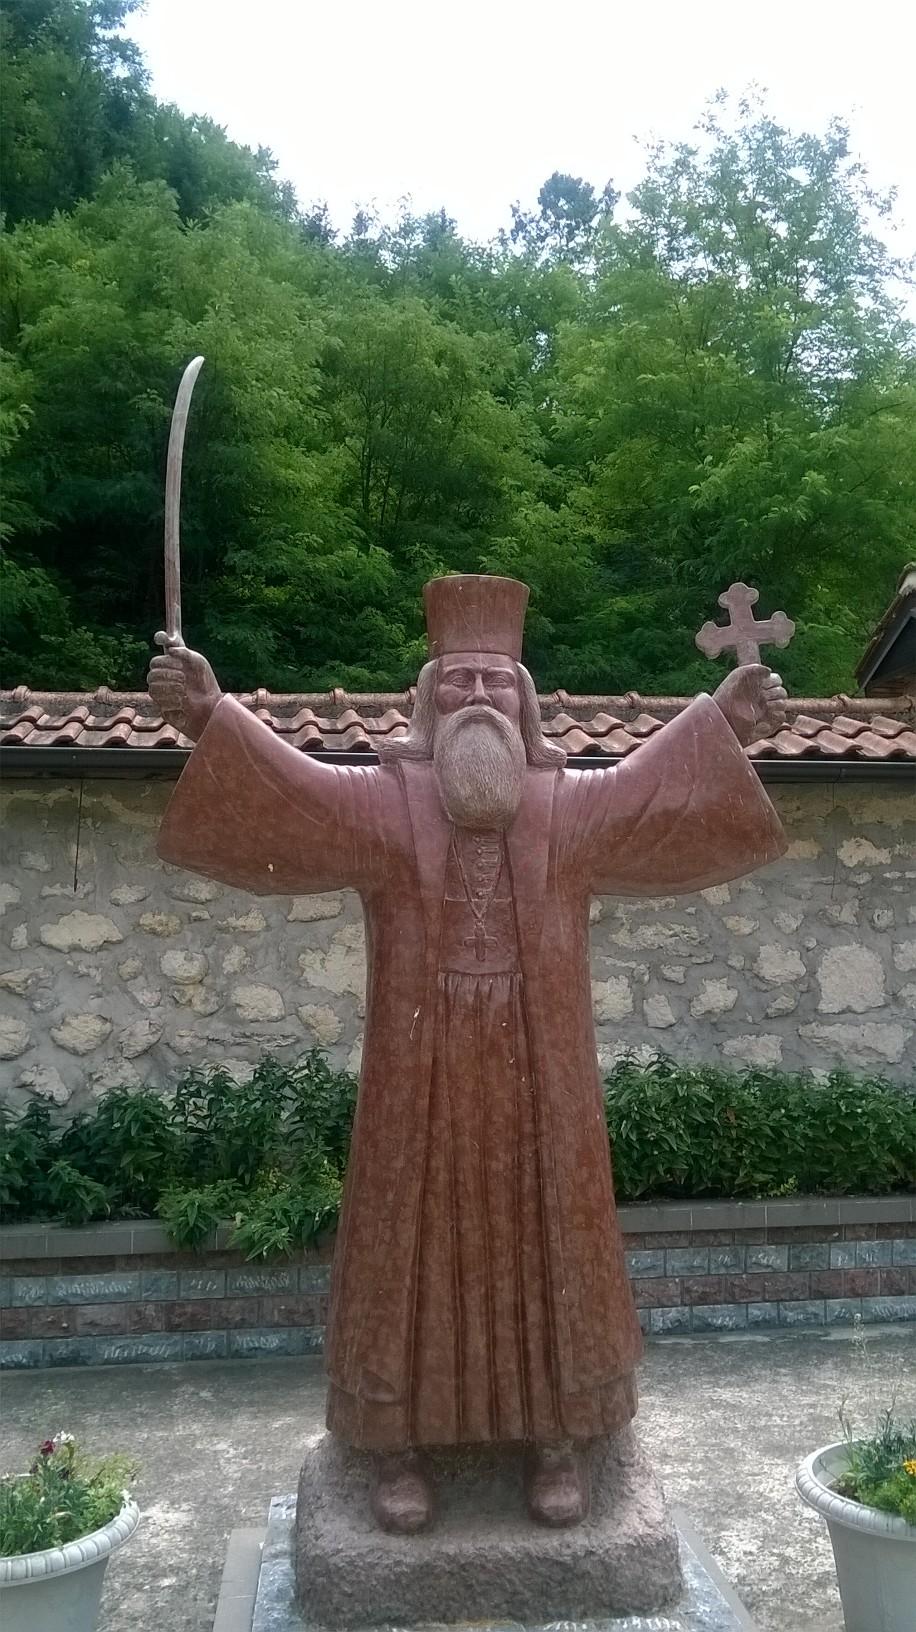 обновитељ манастира два пута